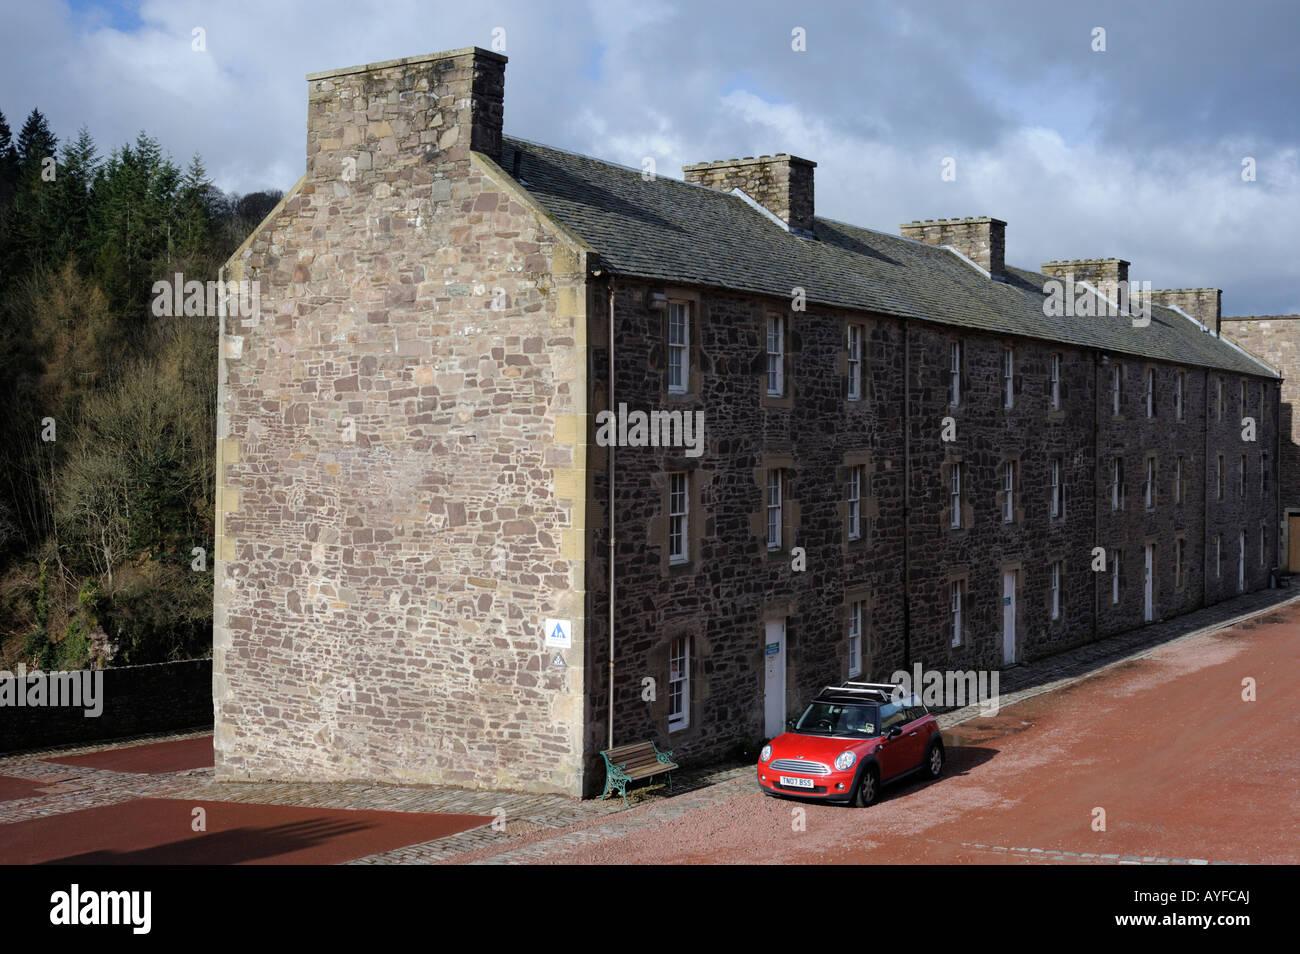 youth-hostel-new-lanark-lanarkshire-scotland-united-kingdom-europe-AYFCAJ.jpg